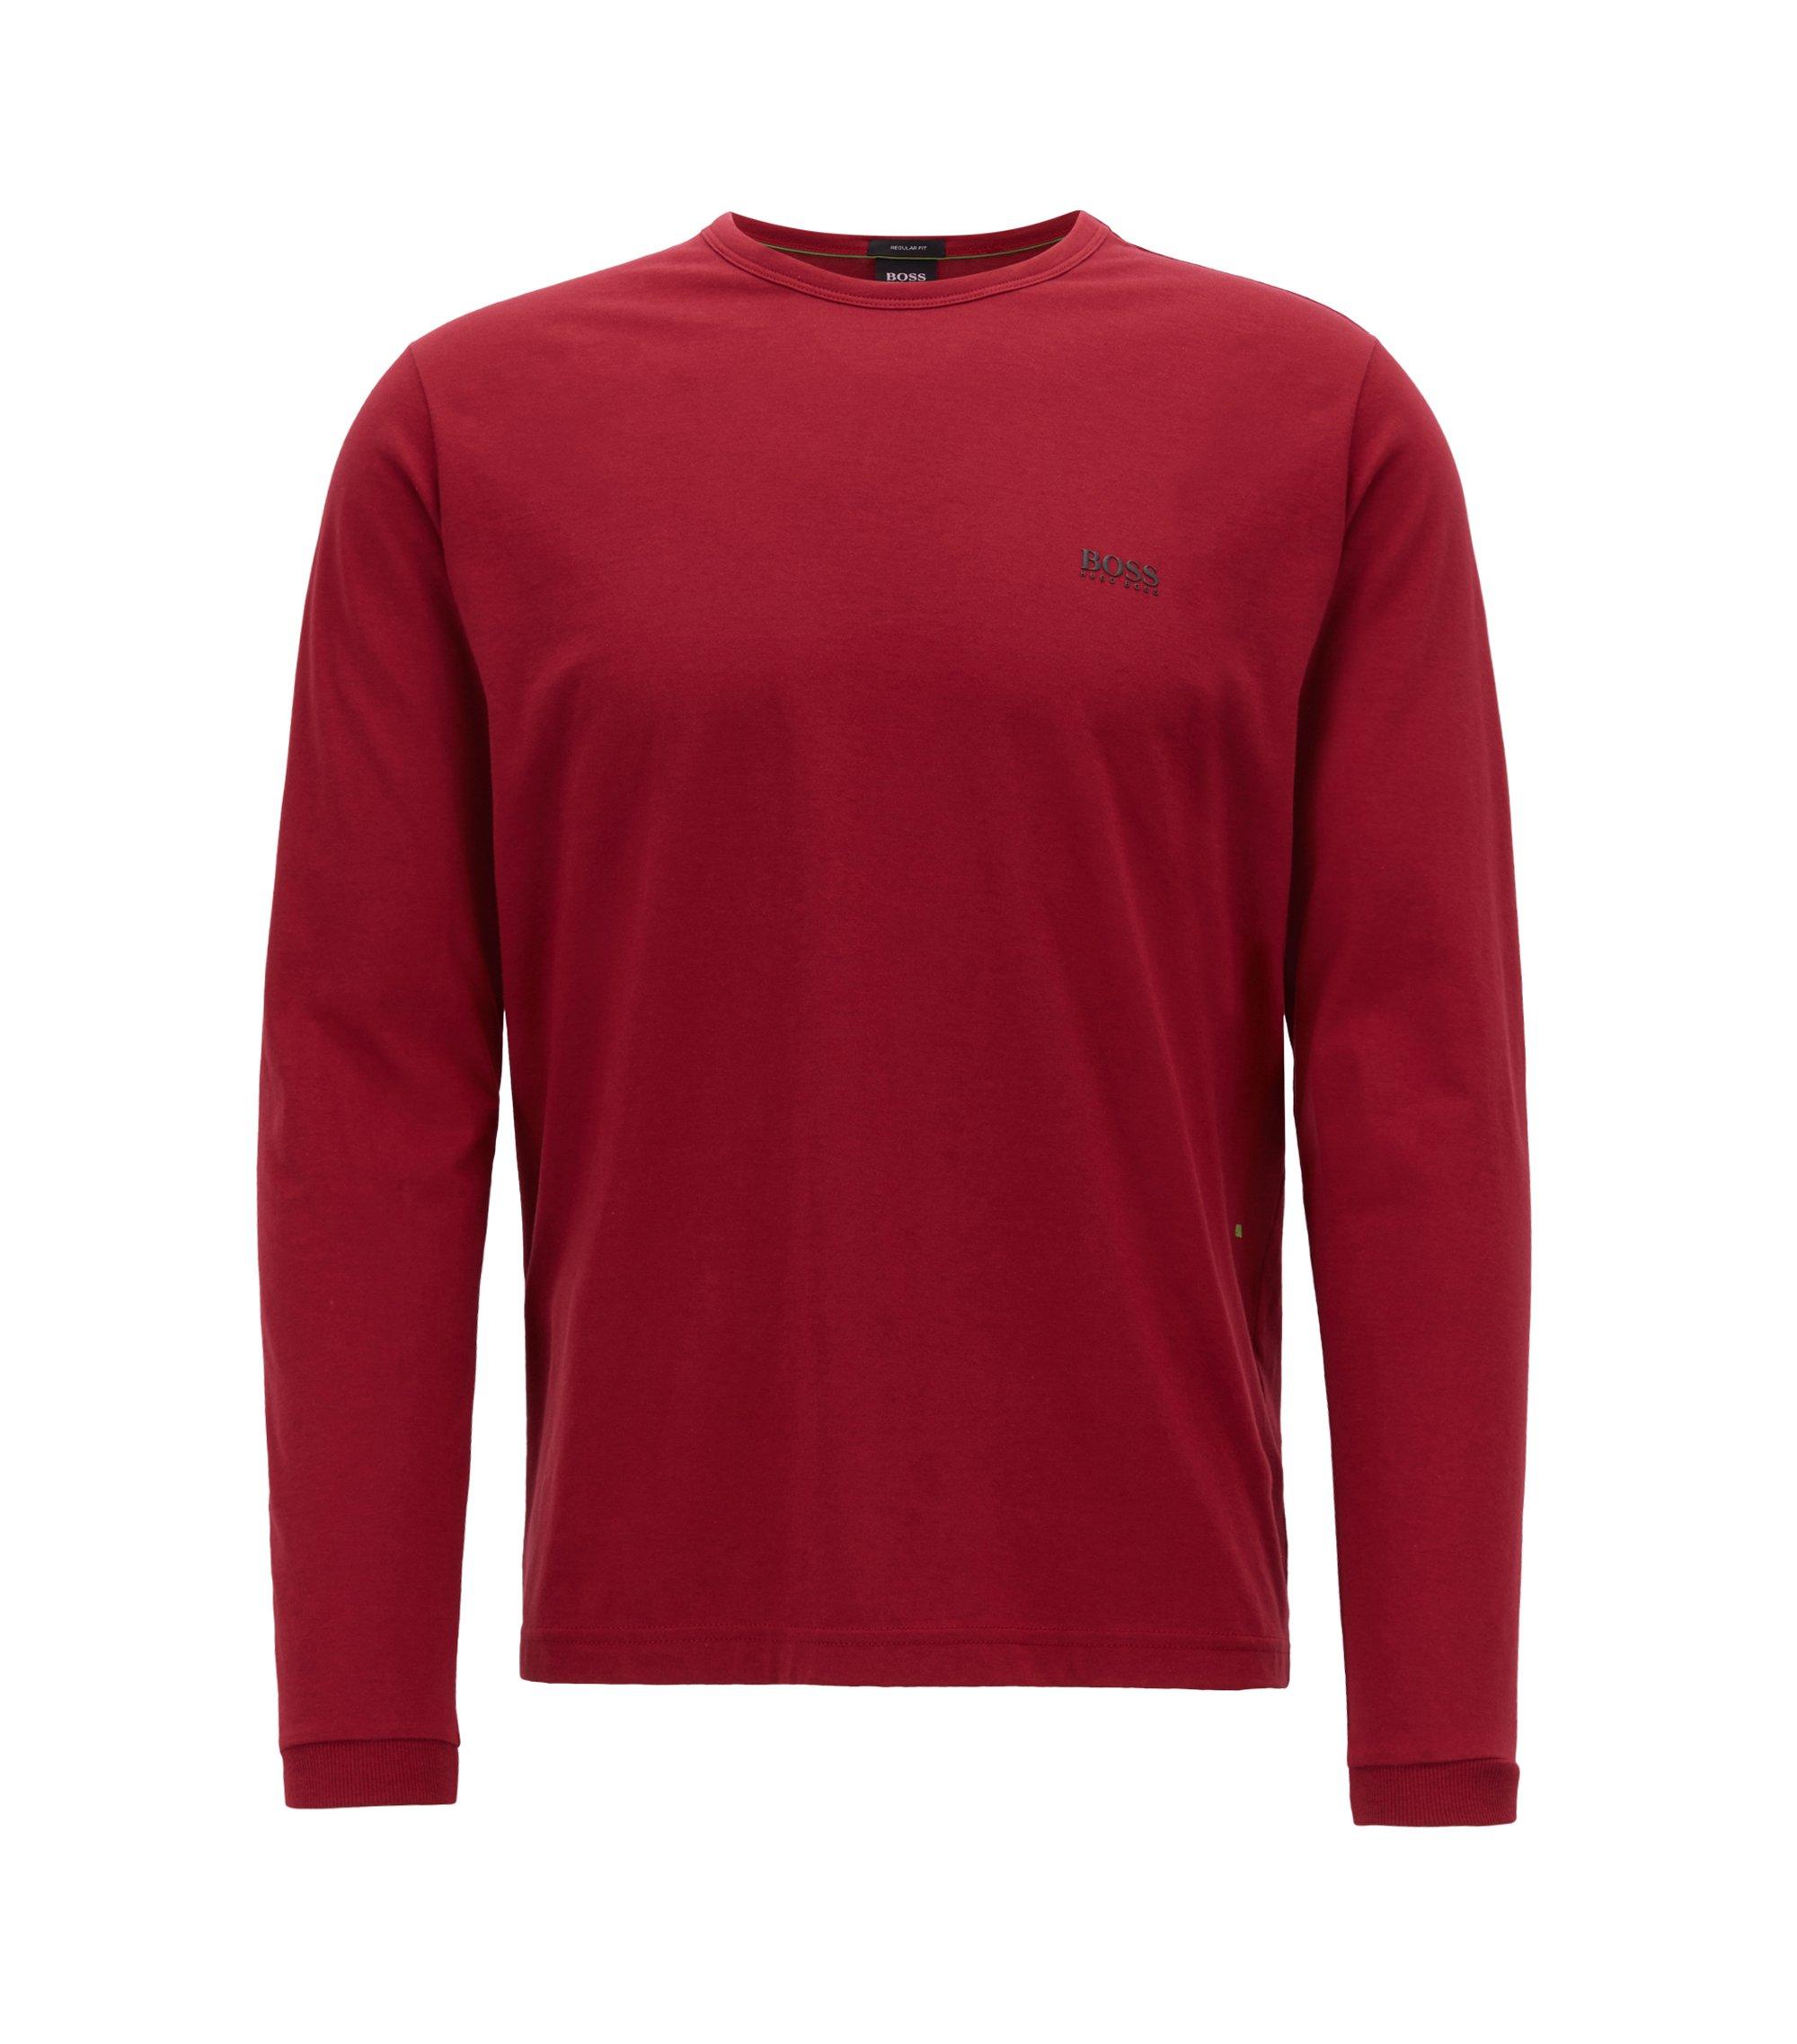 Camiseta de manga larga de algodón con logo en el hombro, Rojo oscuro